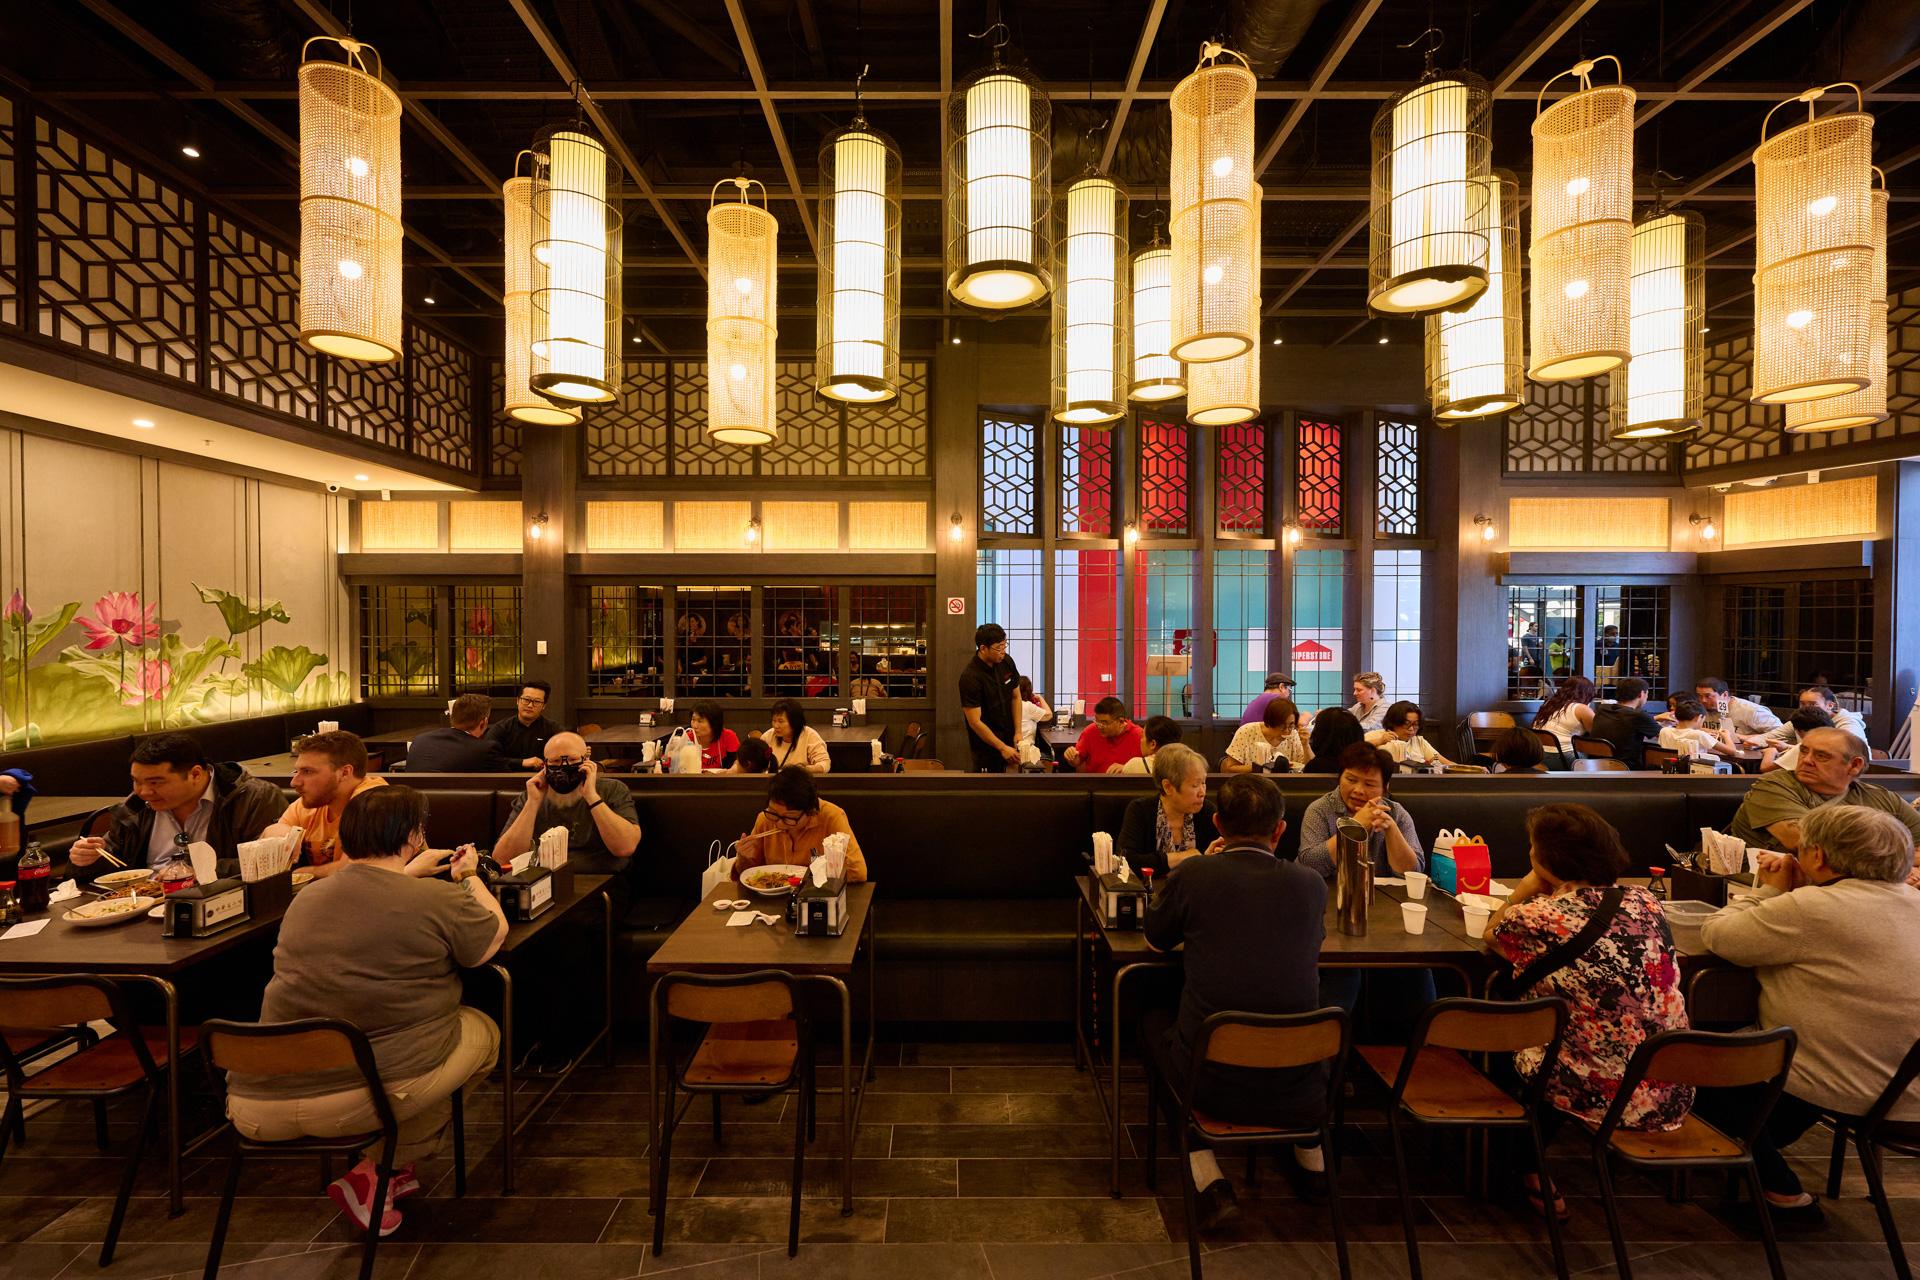 Beautiful interior of Dumplings Plus Restaurant.